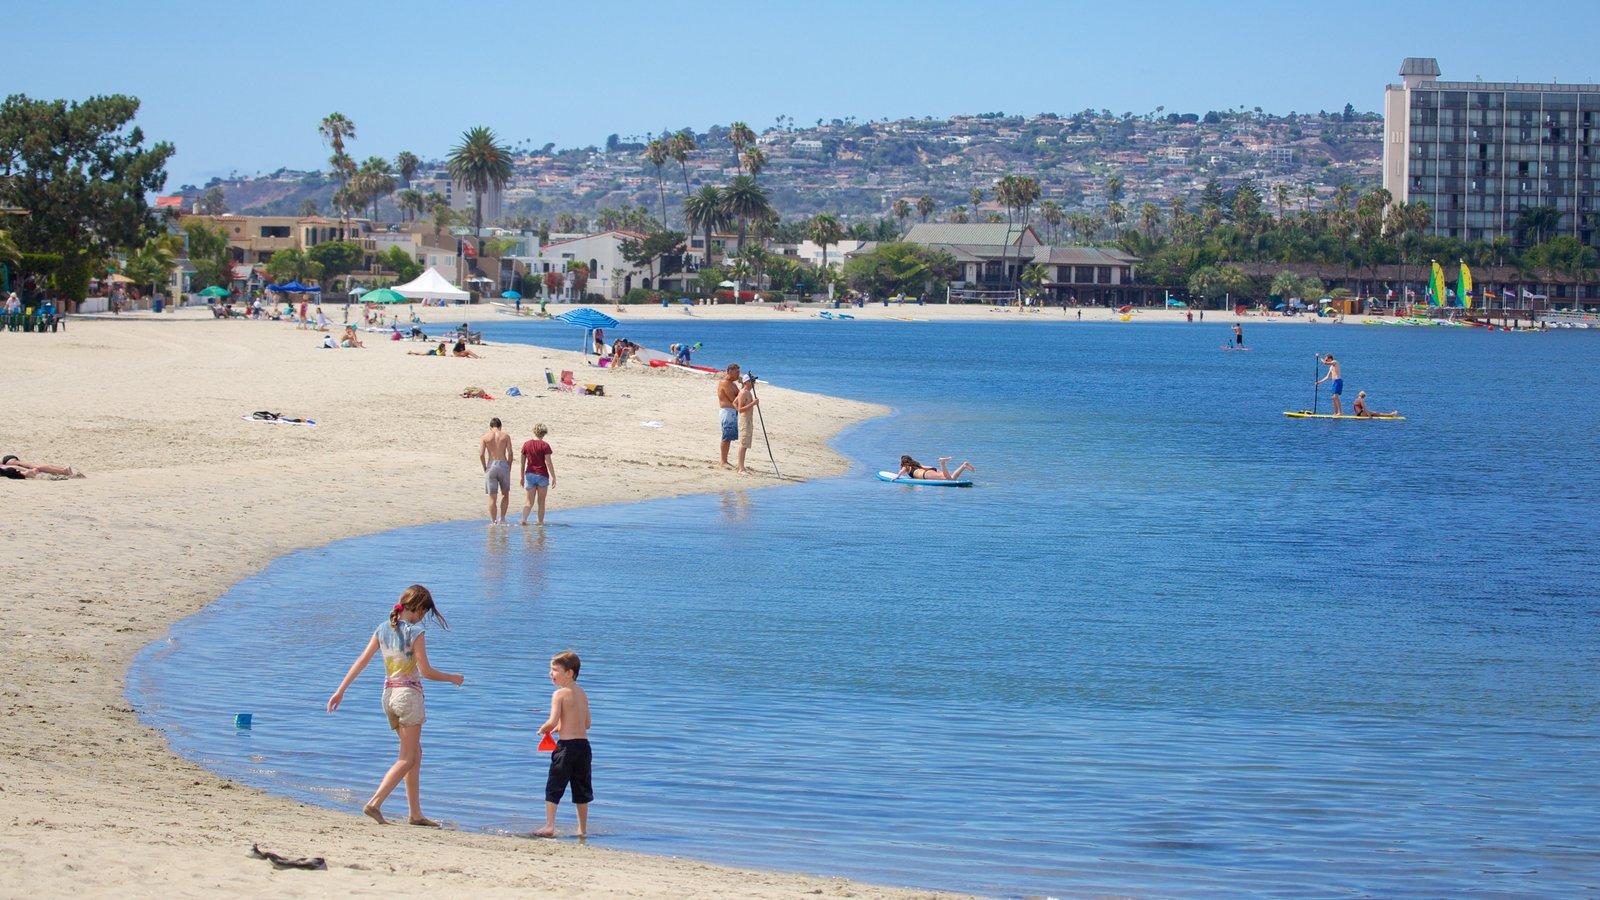 Mission Bay caracterizando uma praia de areia